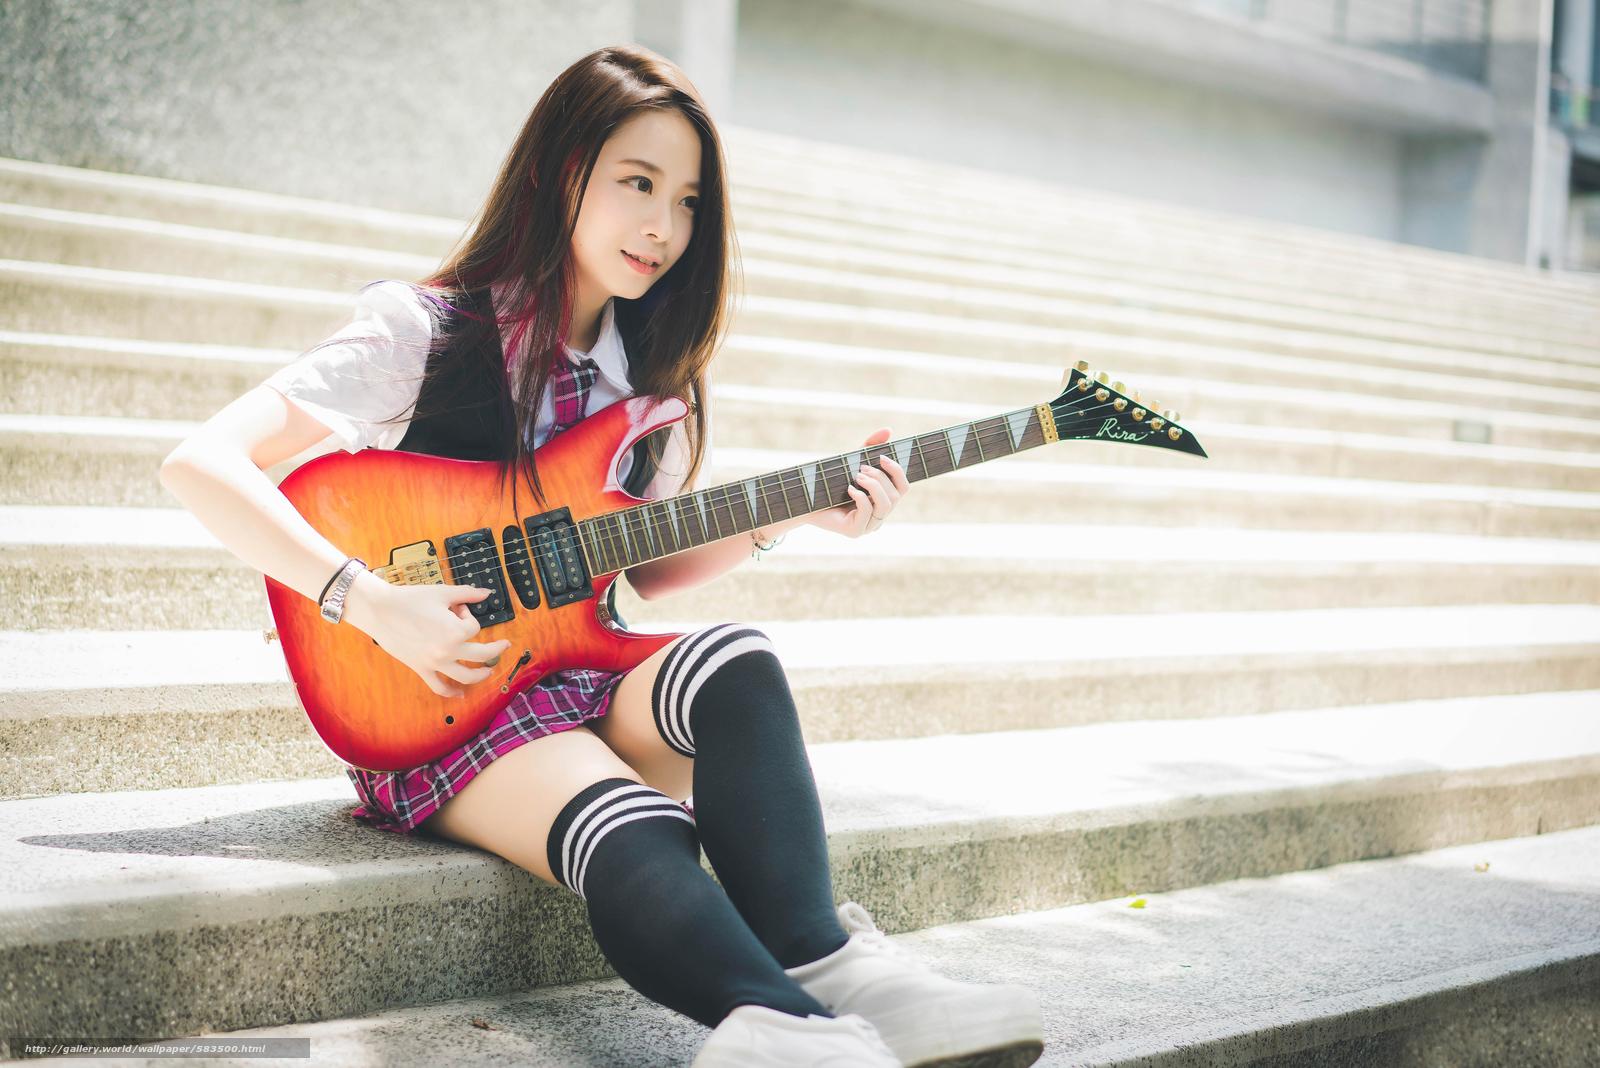 Download wallpaper guitarist,  Eastern,  Socks,  tie free desktop wallpaper in the resolution 5360x3577 — picture №583500